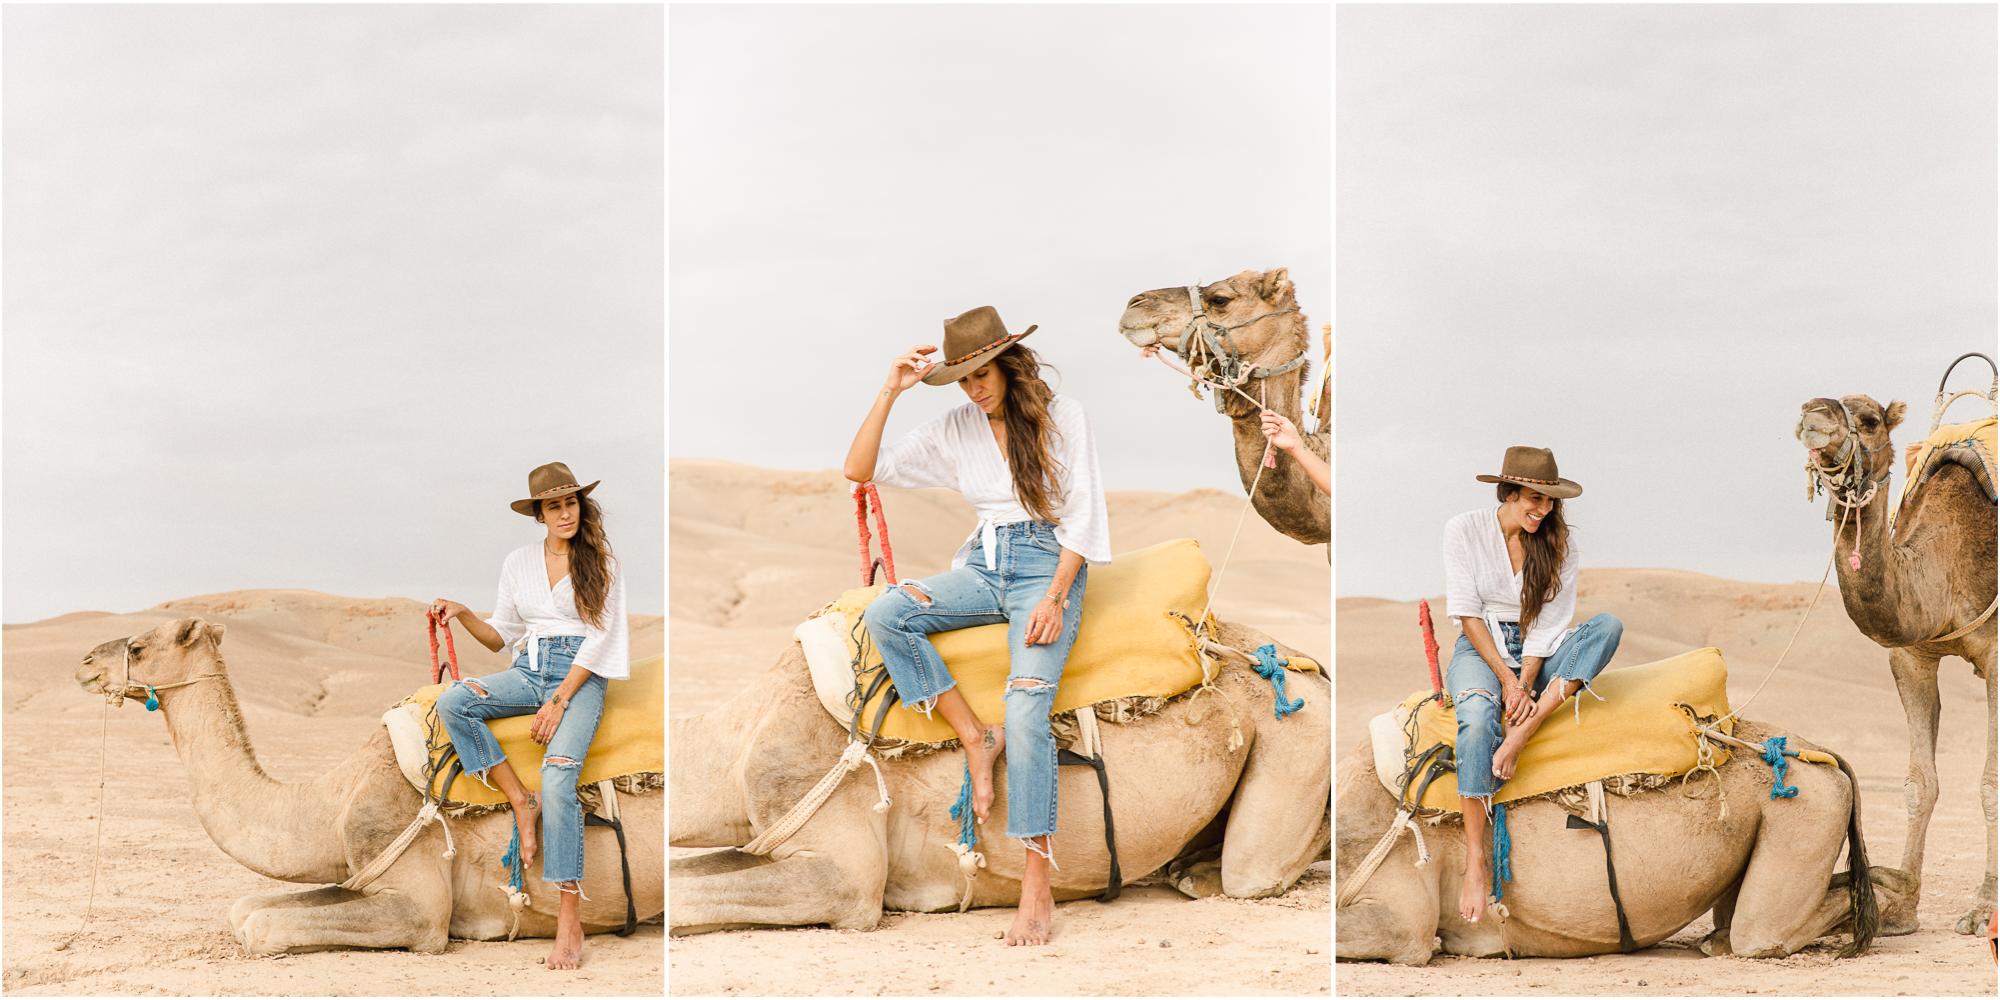 Morocco Photography Adventure 24-1.jpg